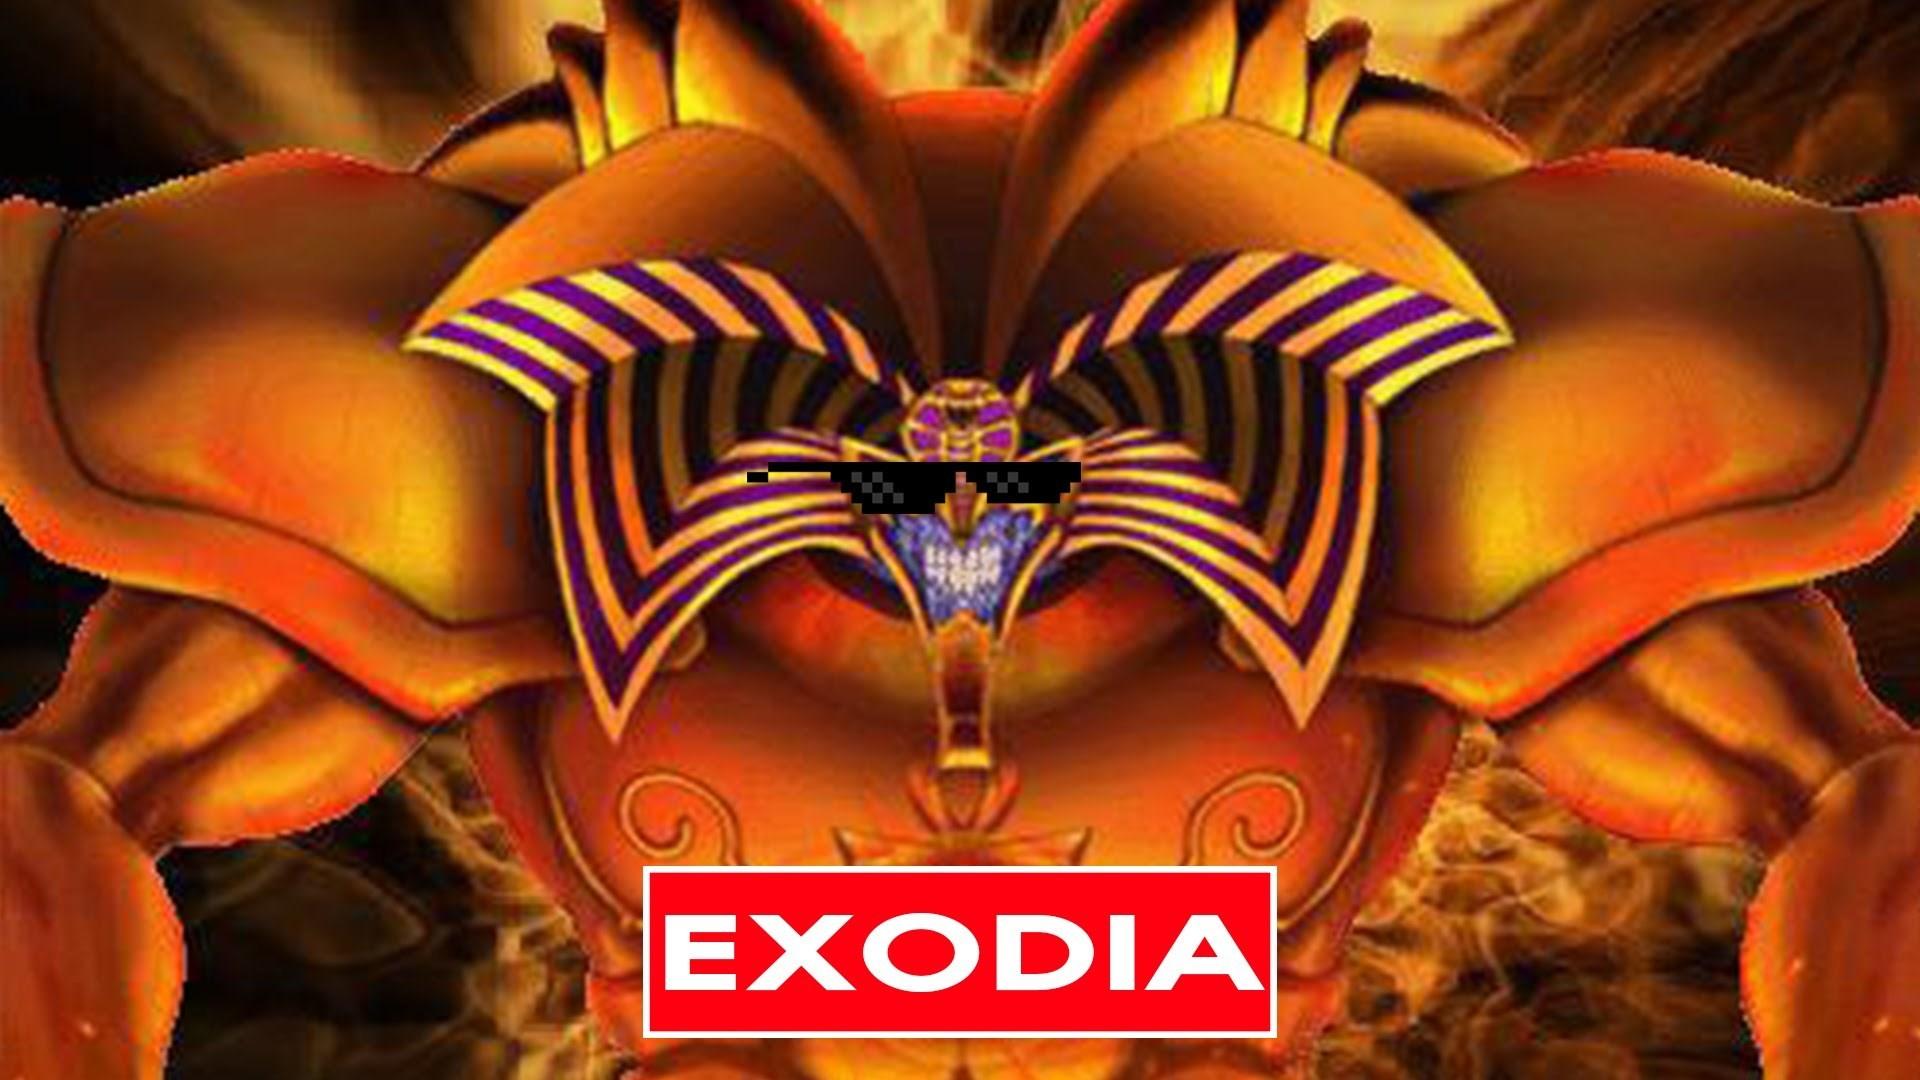 Exodia Wallpaper